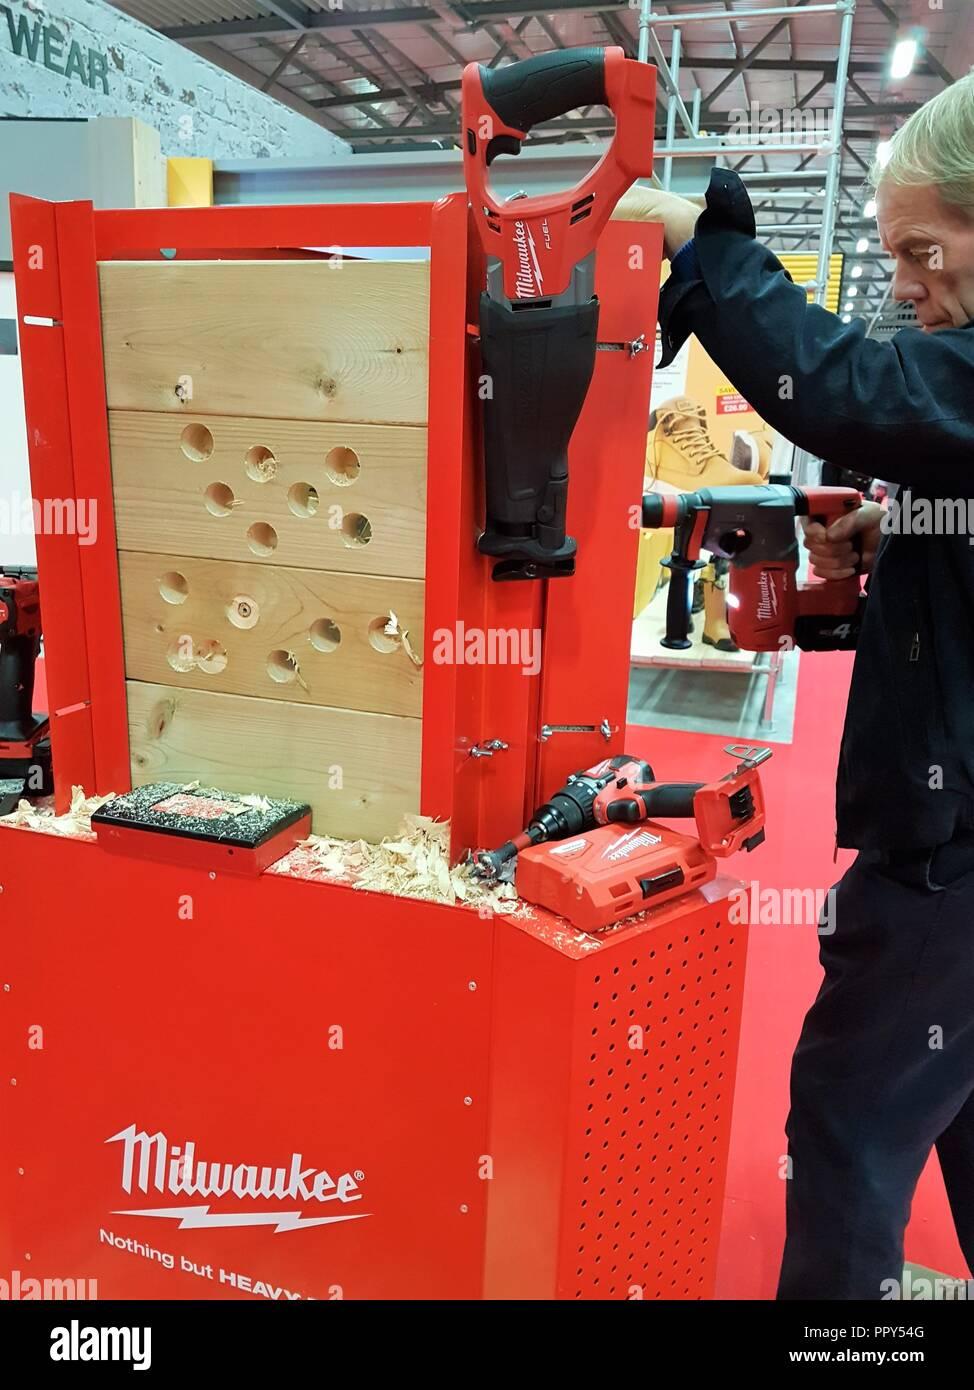 Milwaukee Tools Stock Photos & Milwaukee Tools Stock Images